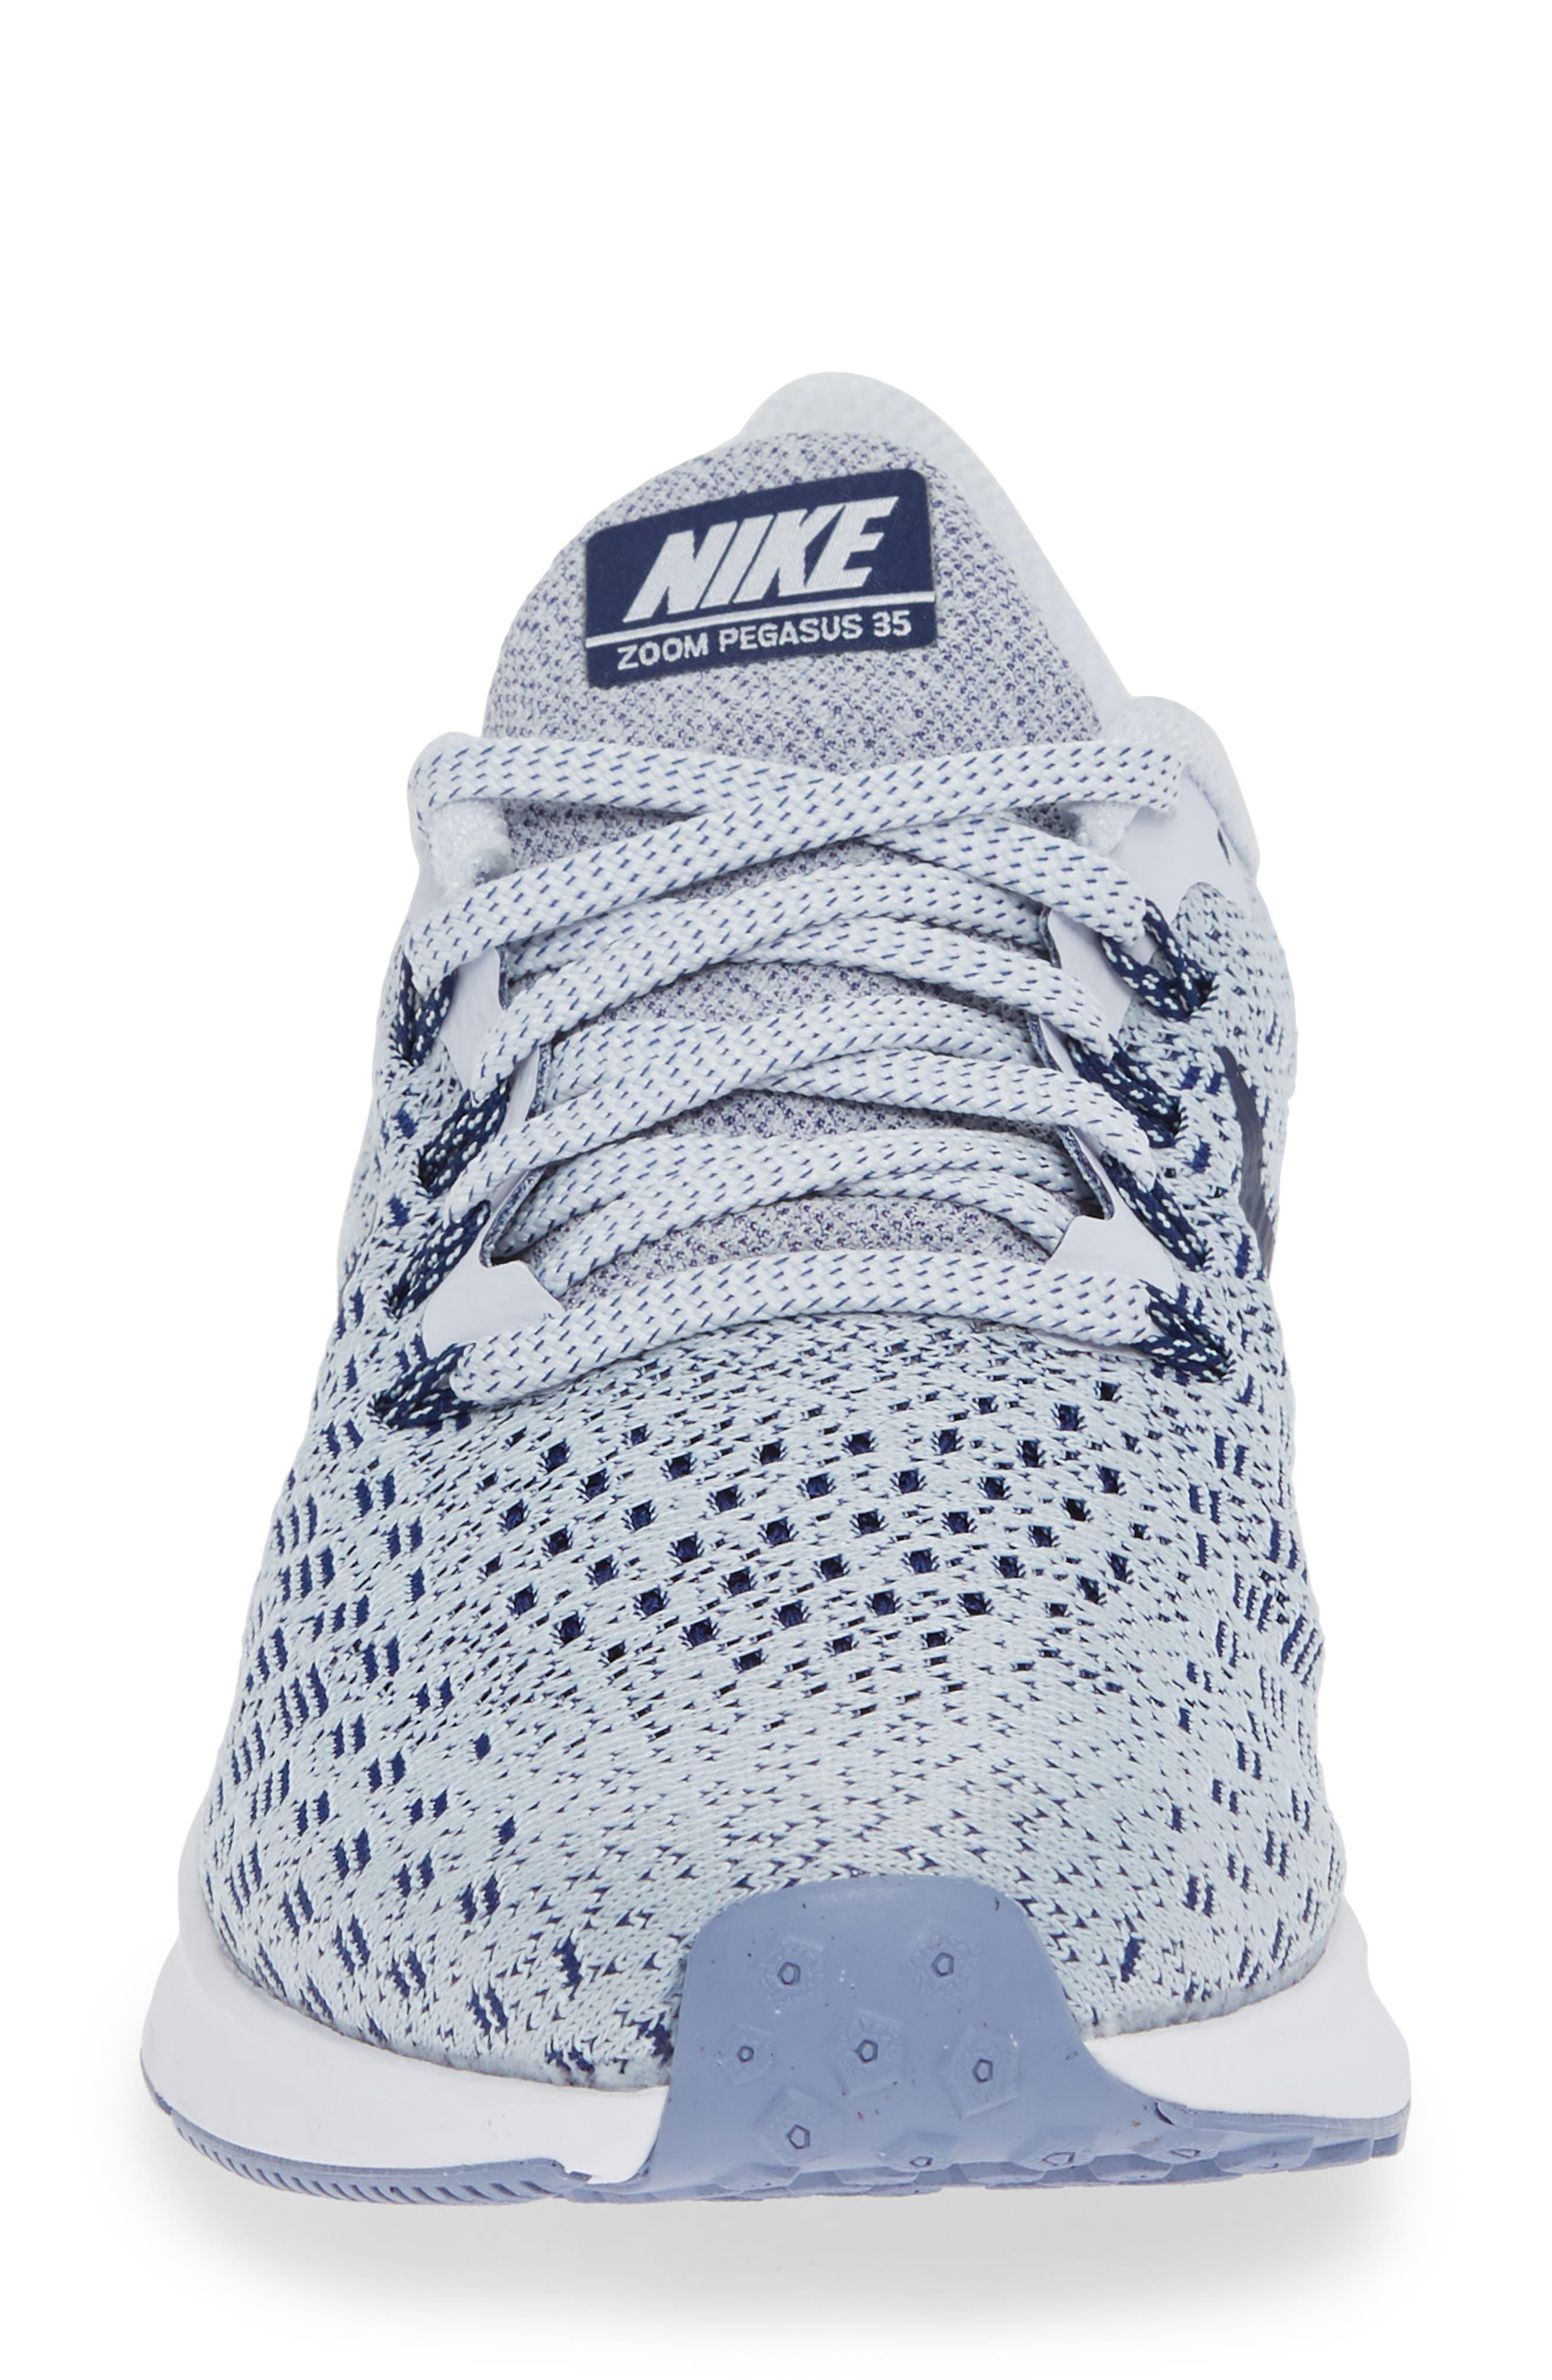 Air Zoom Pegasus 35 Running Shoe,                             Alternate thumbnail 4, color,                             GREY/ BLUE/ WHITE/ ALUMINUM